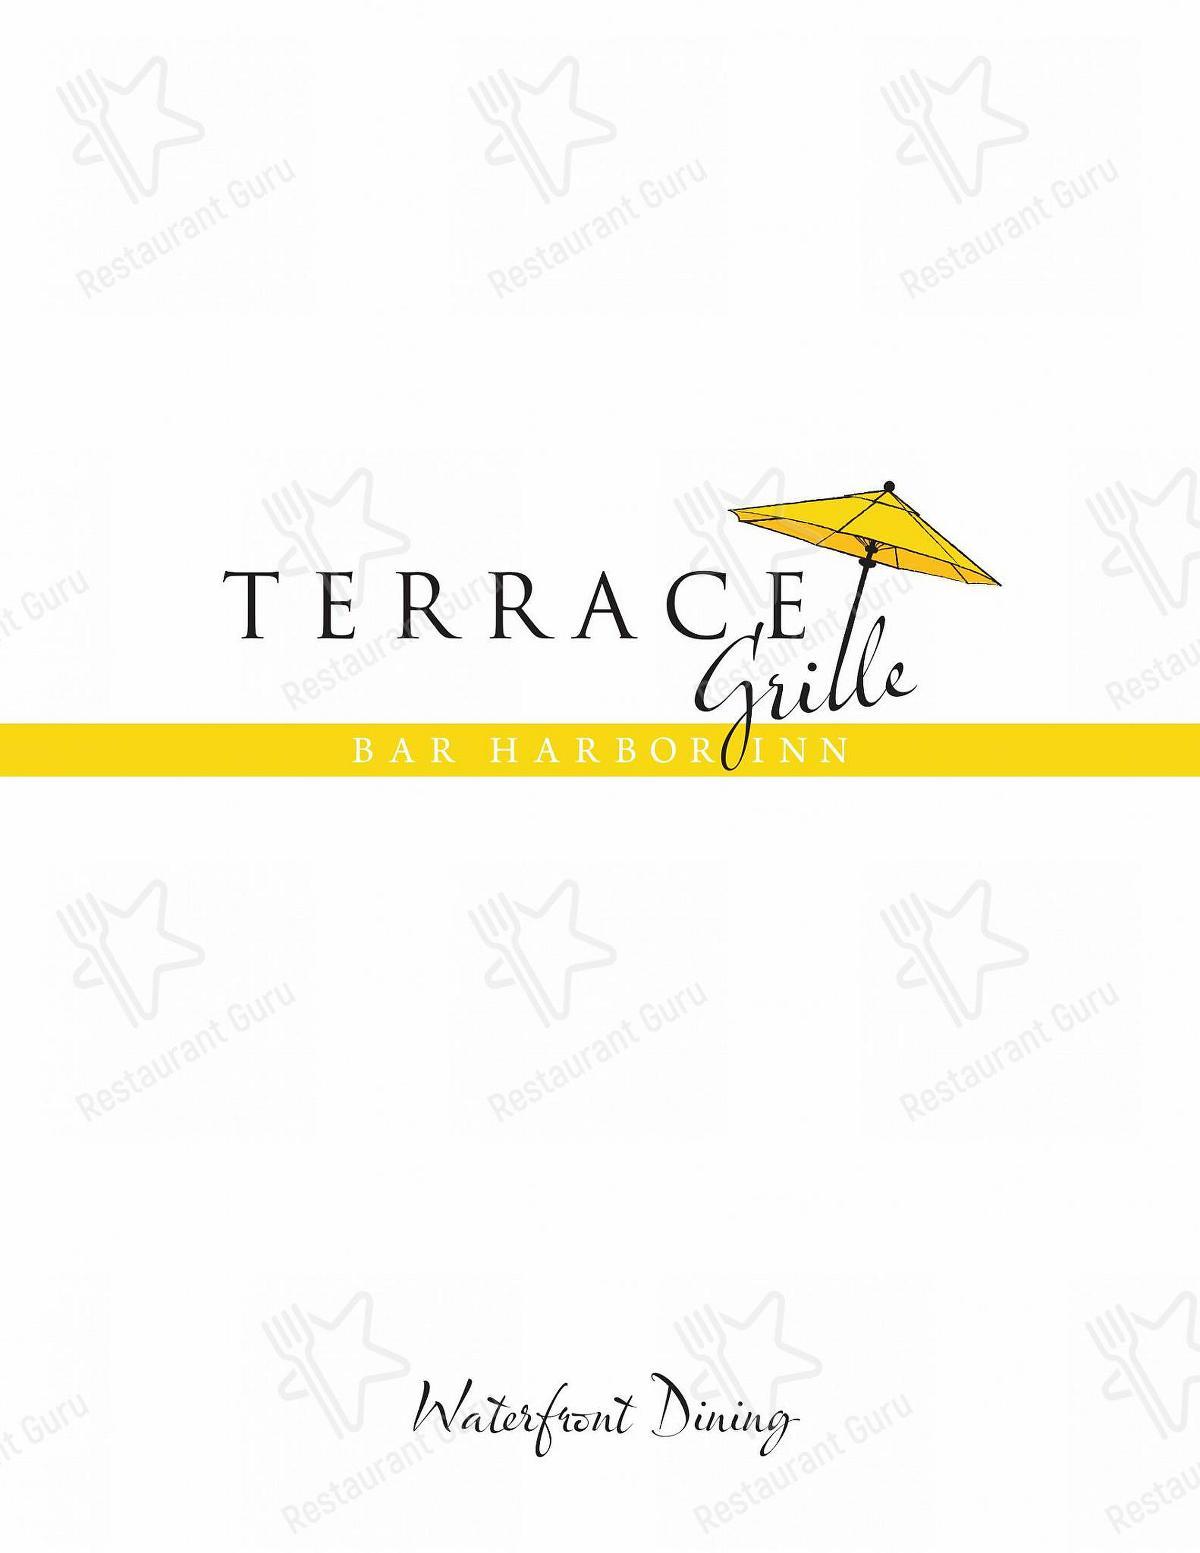 Menu for the The Terrace Grille pub & bar